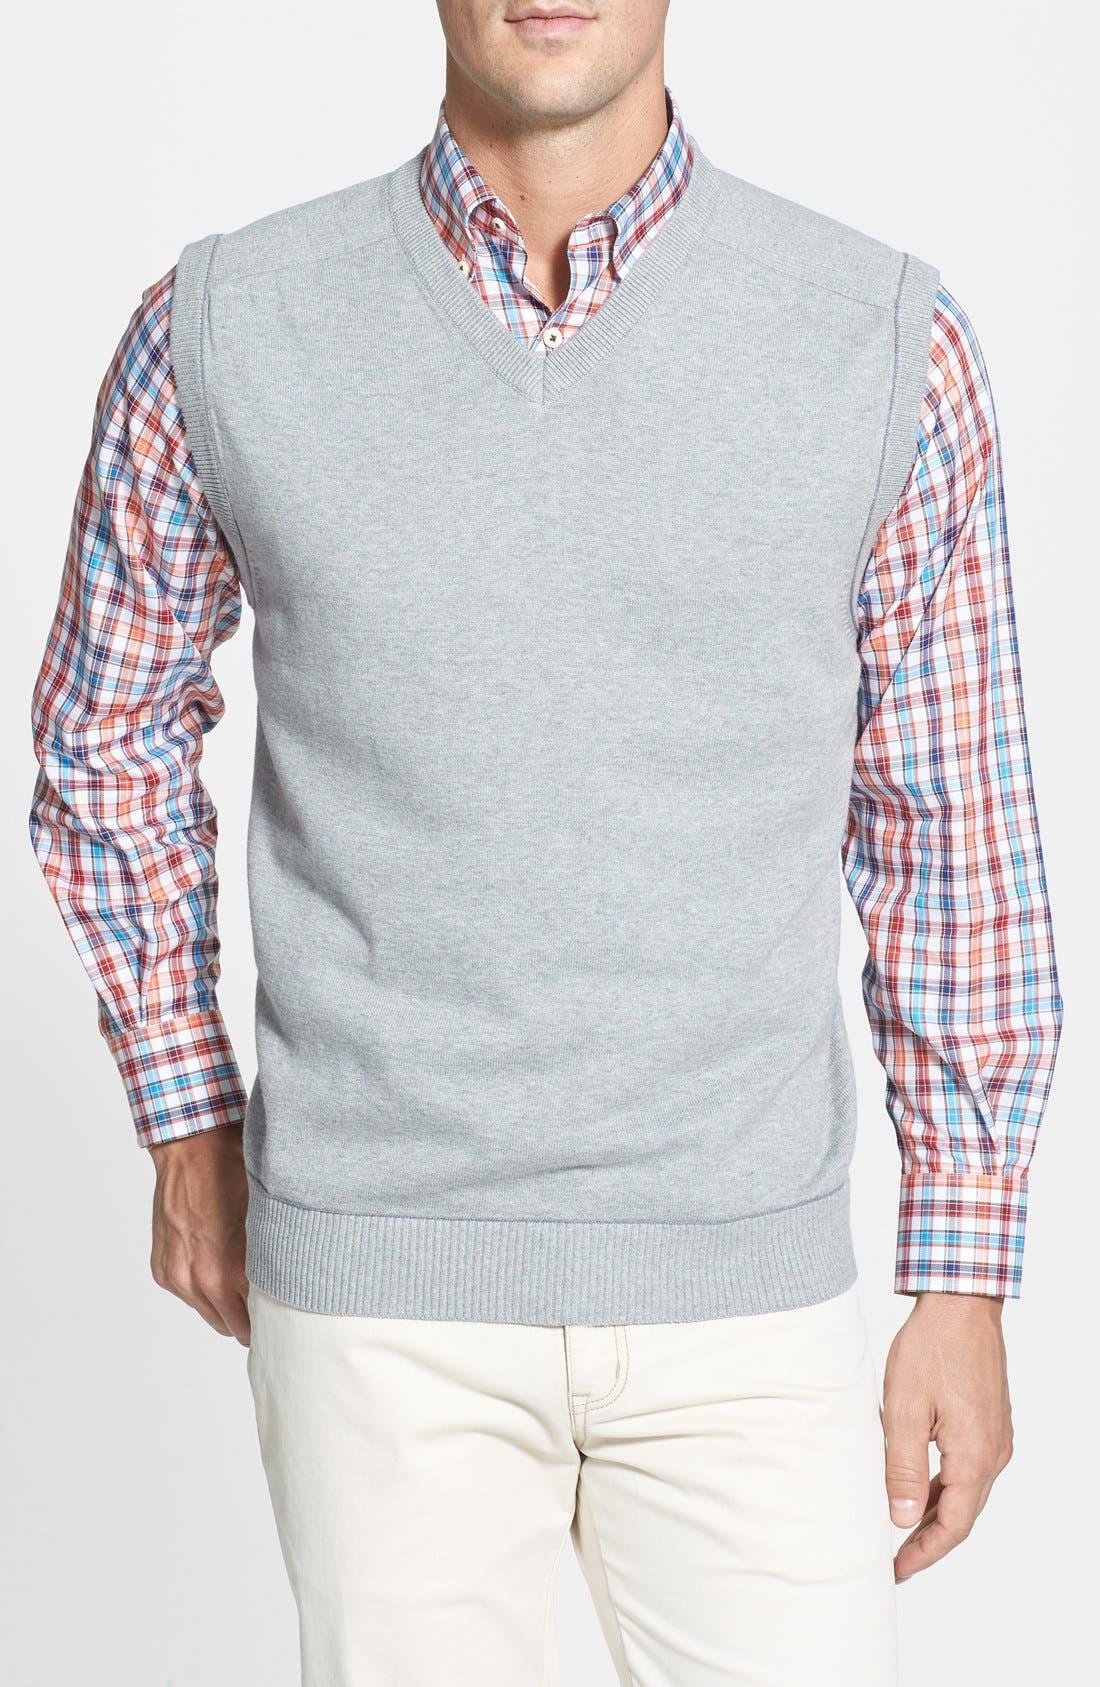 Main Image - Cutter & Buck Broadview V-Neck Sweater Vest